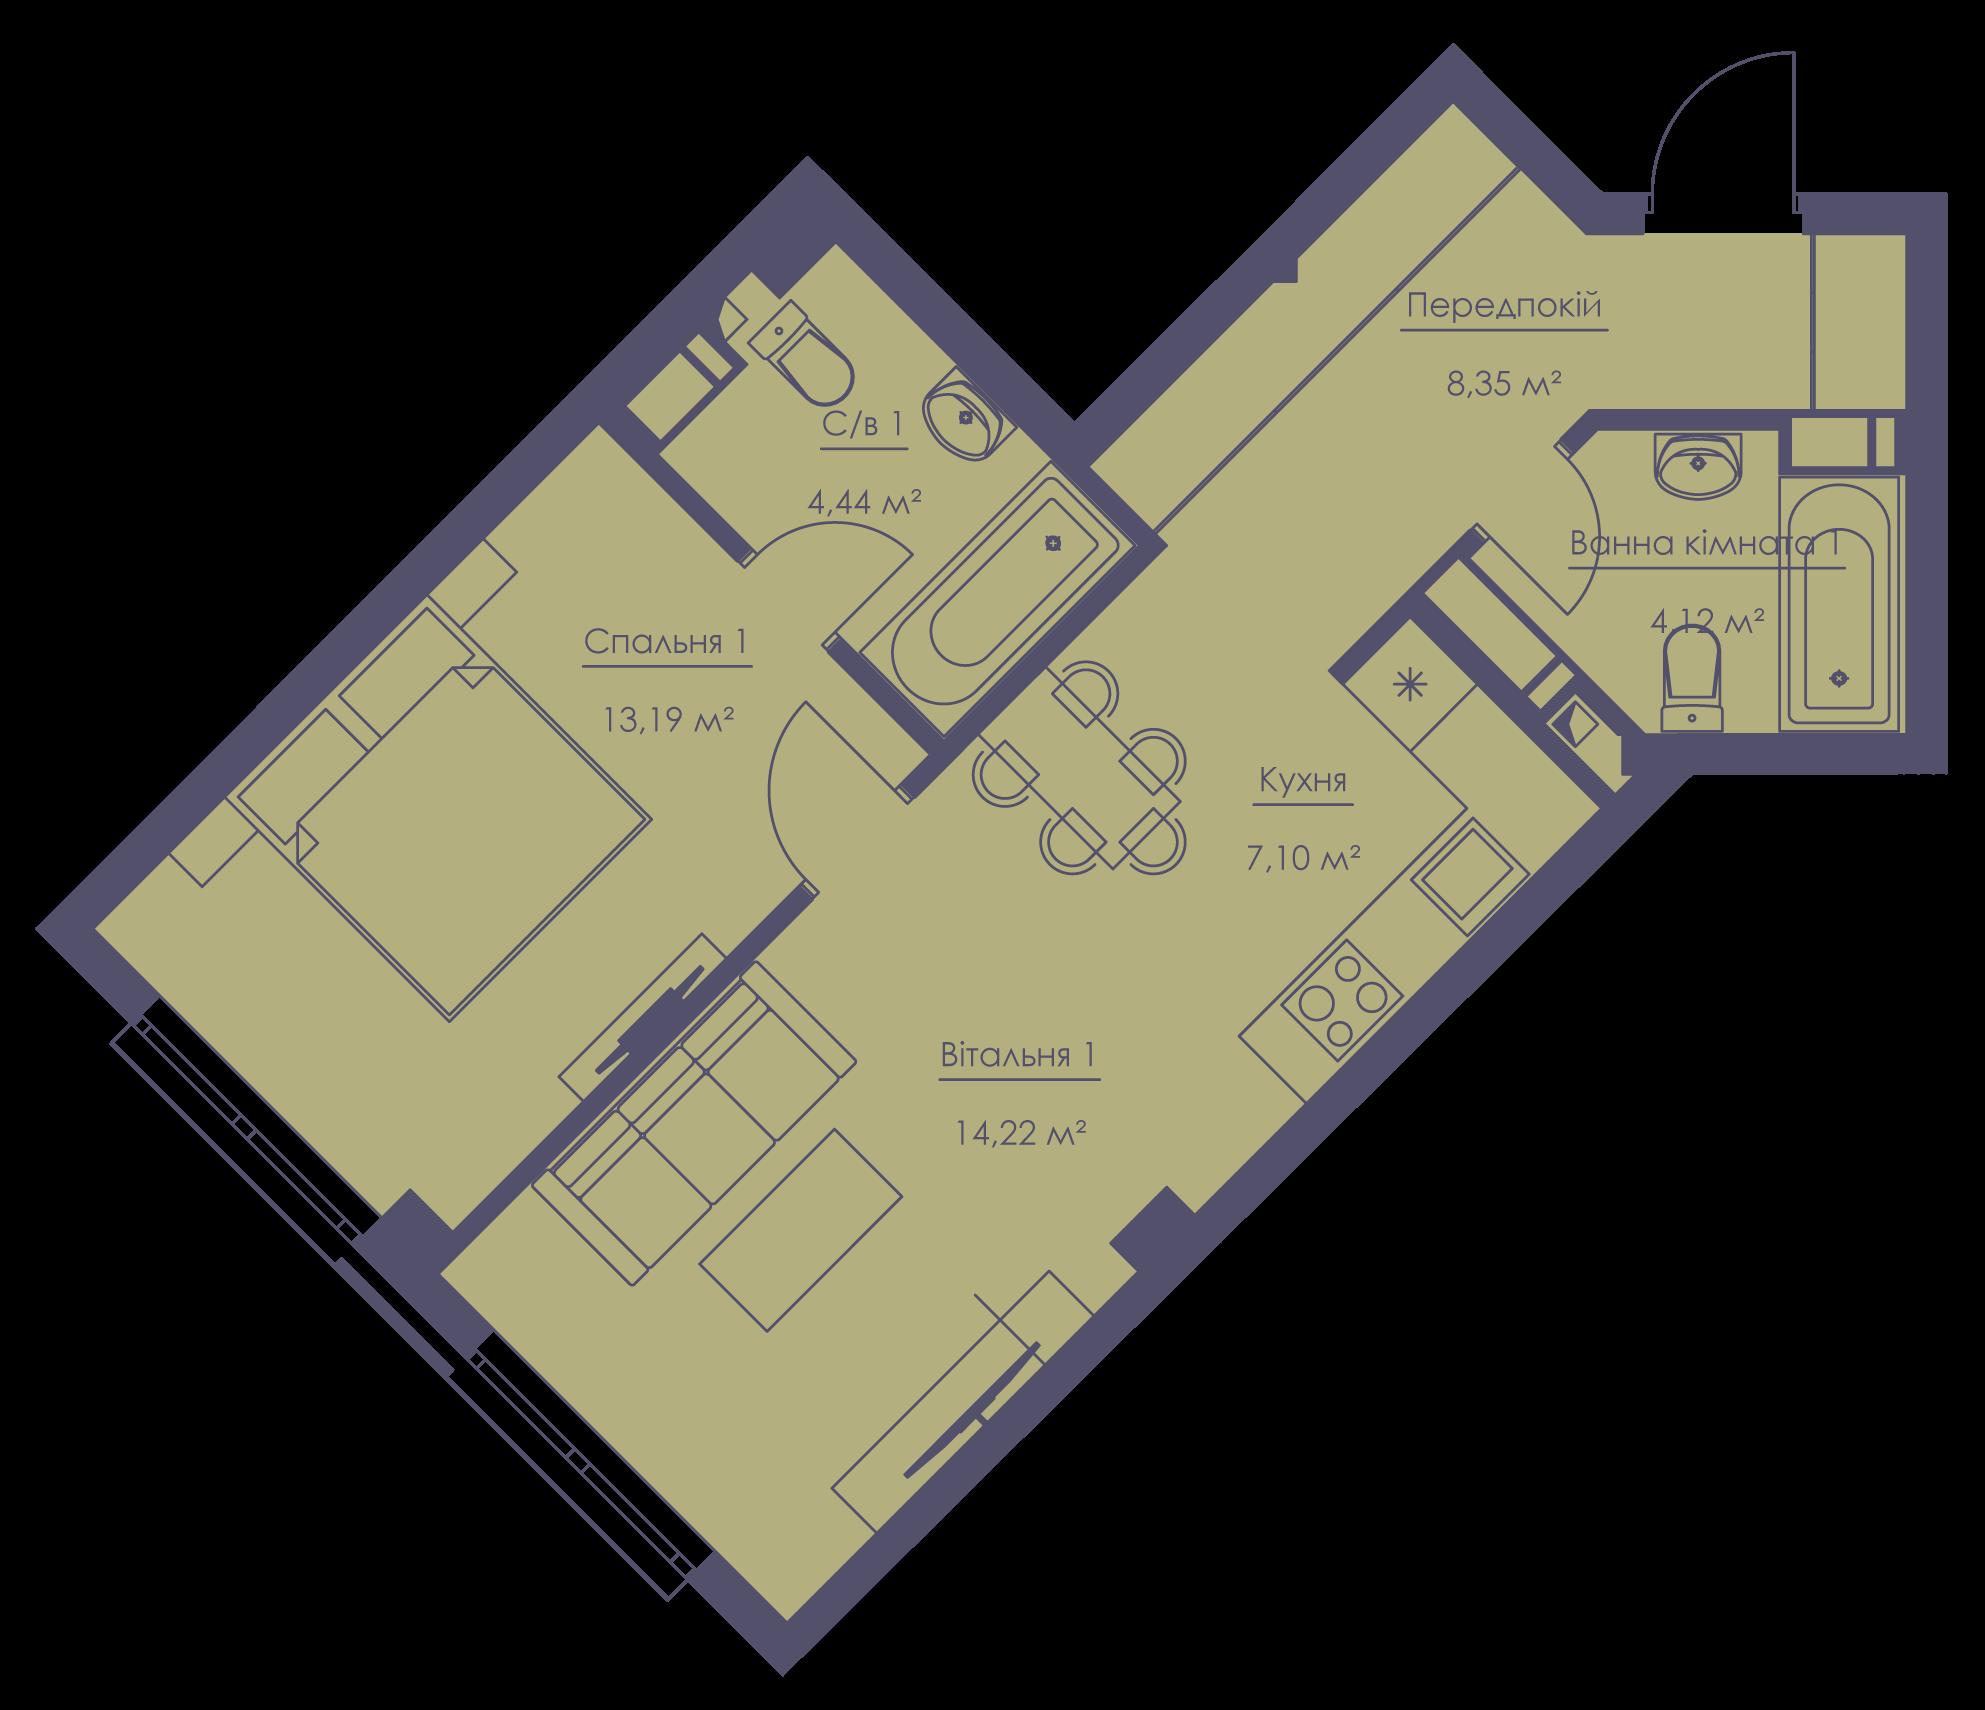 Apartment layout KV_35_2m_1_1_3-1